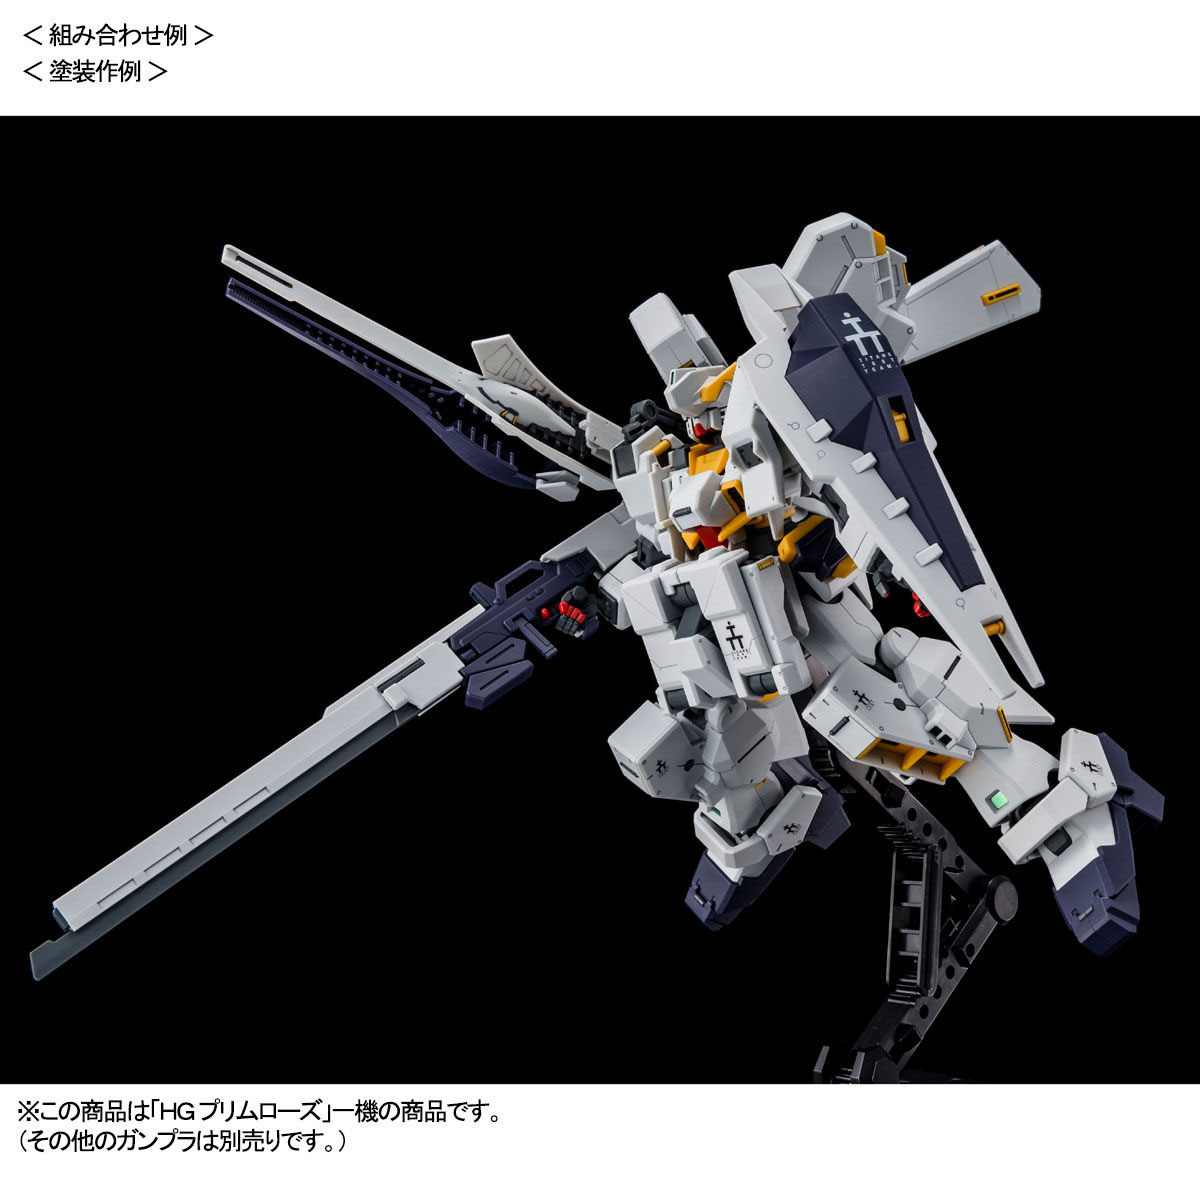 HG 1/144『緊急脱出ポッド[プリムローズ]』プラモデル-008